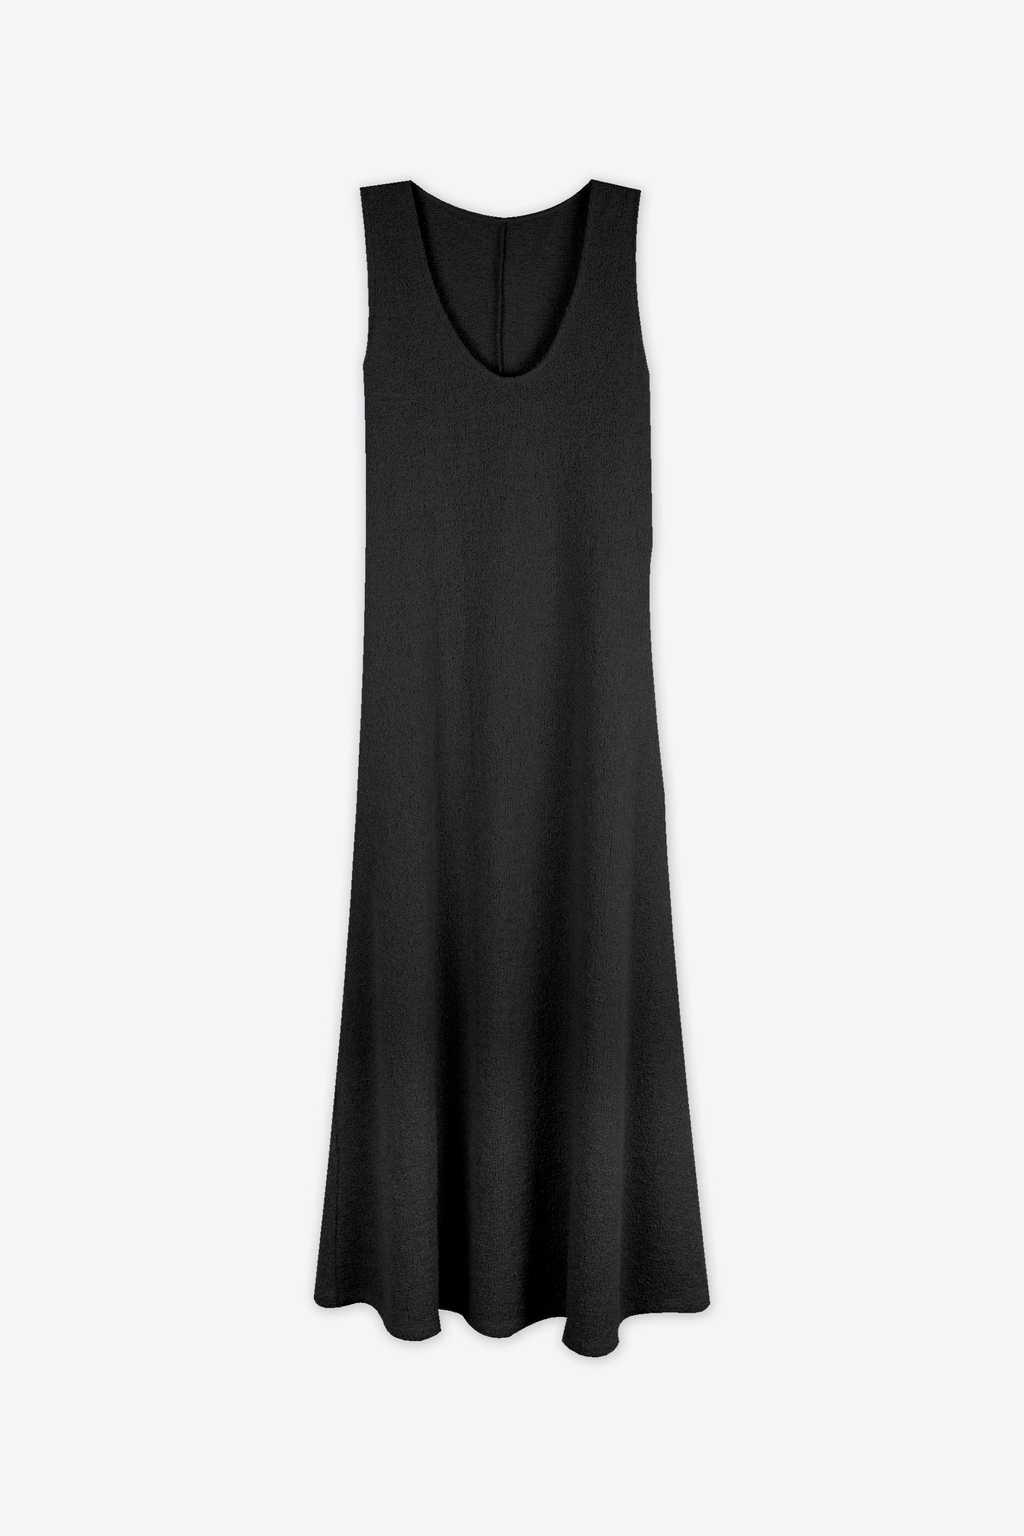 Dress 726 Black 5